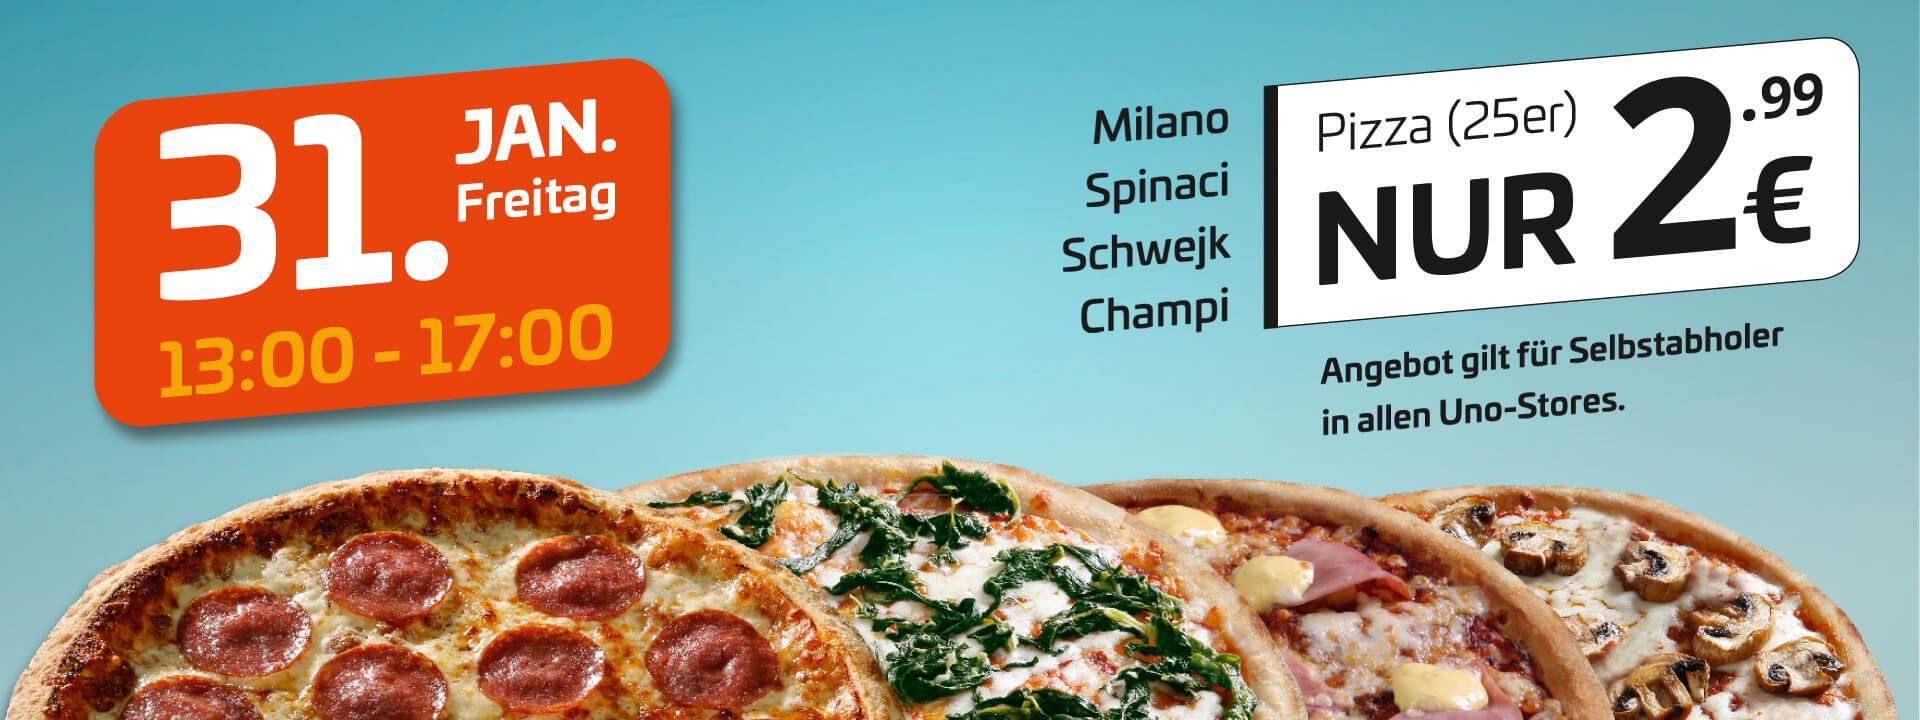 [lokal Magdeburg, Halle, Leipzig, Merseburg] uno Pizza Milano, Spinaci, Schwejk, Champi (25 cm) am Freitag, 31. Jan. von 13-17 Uhr je 2,99 €